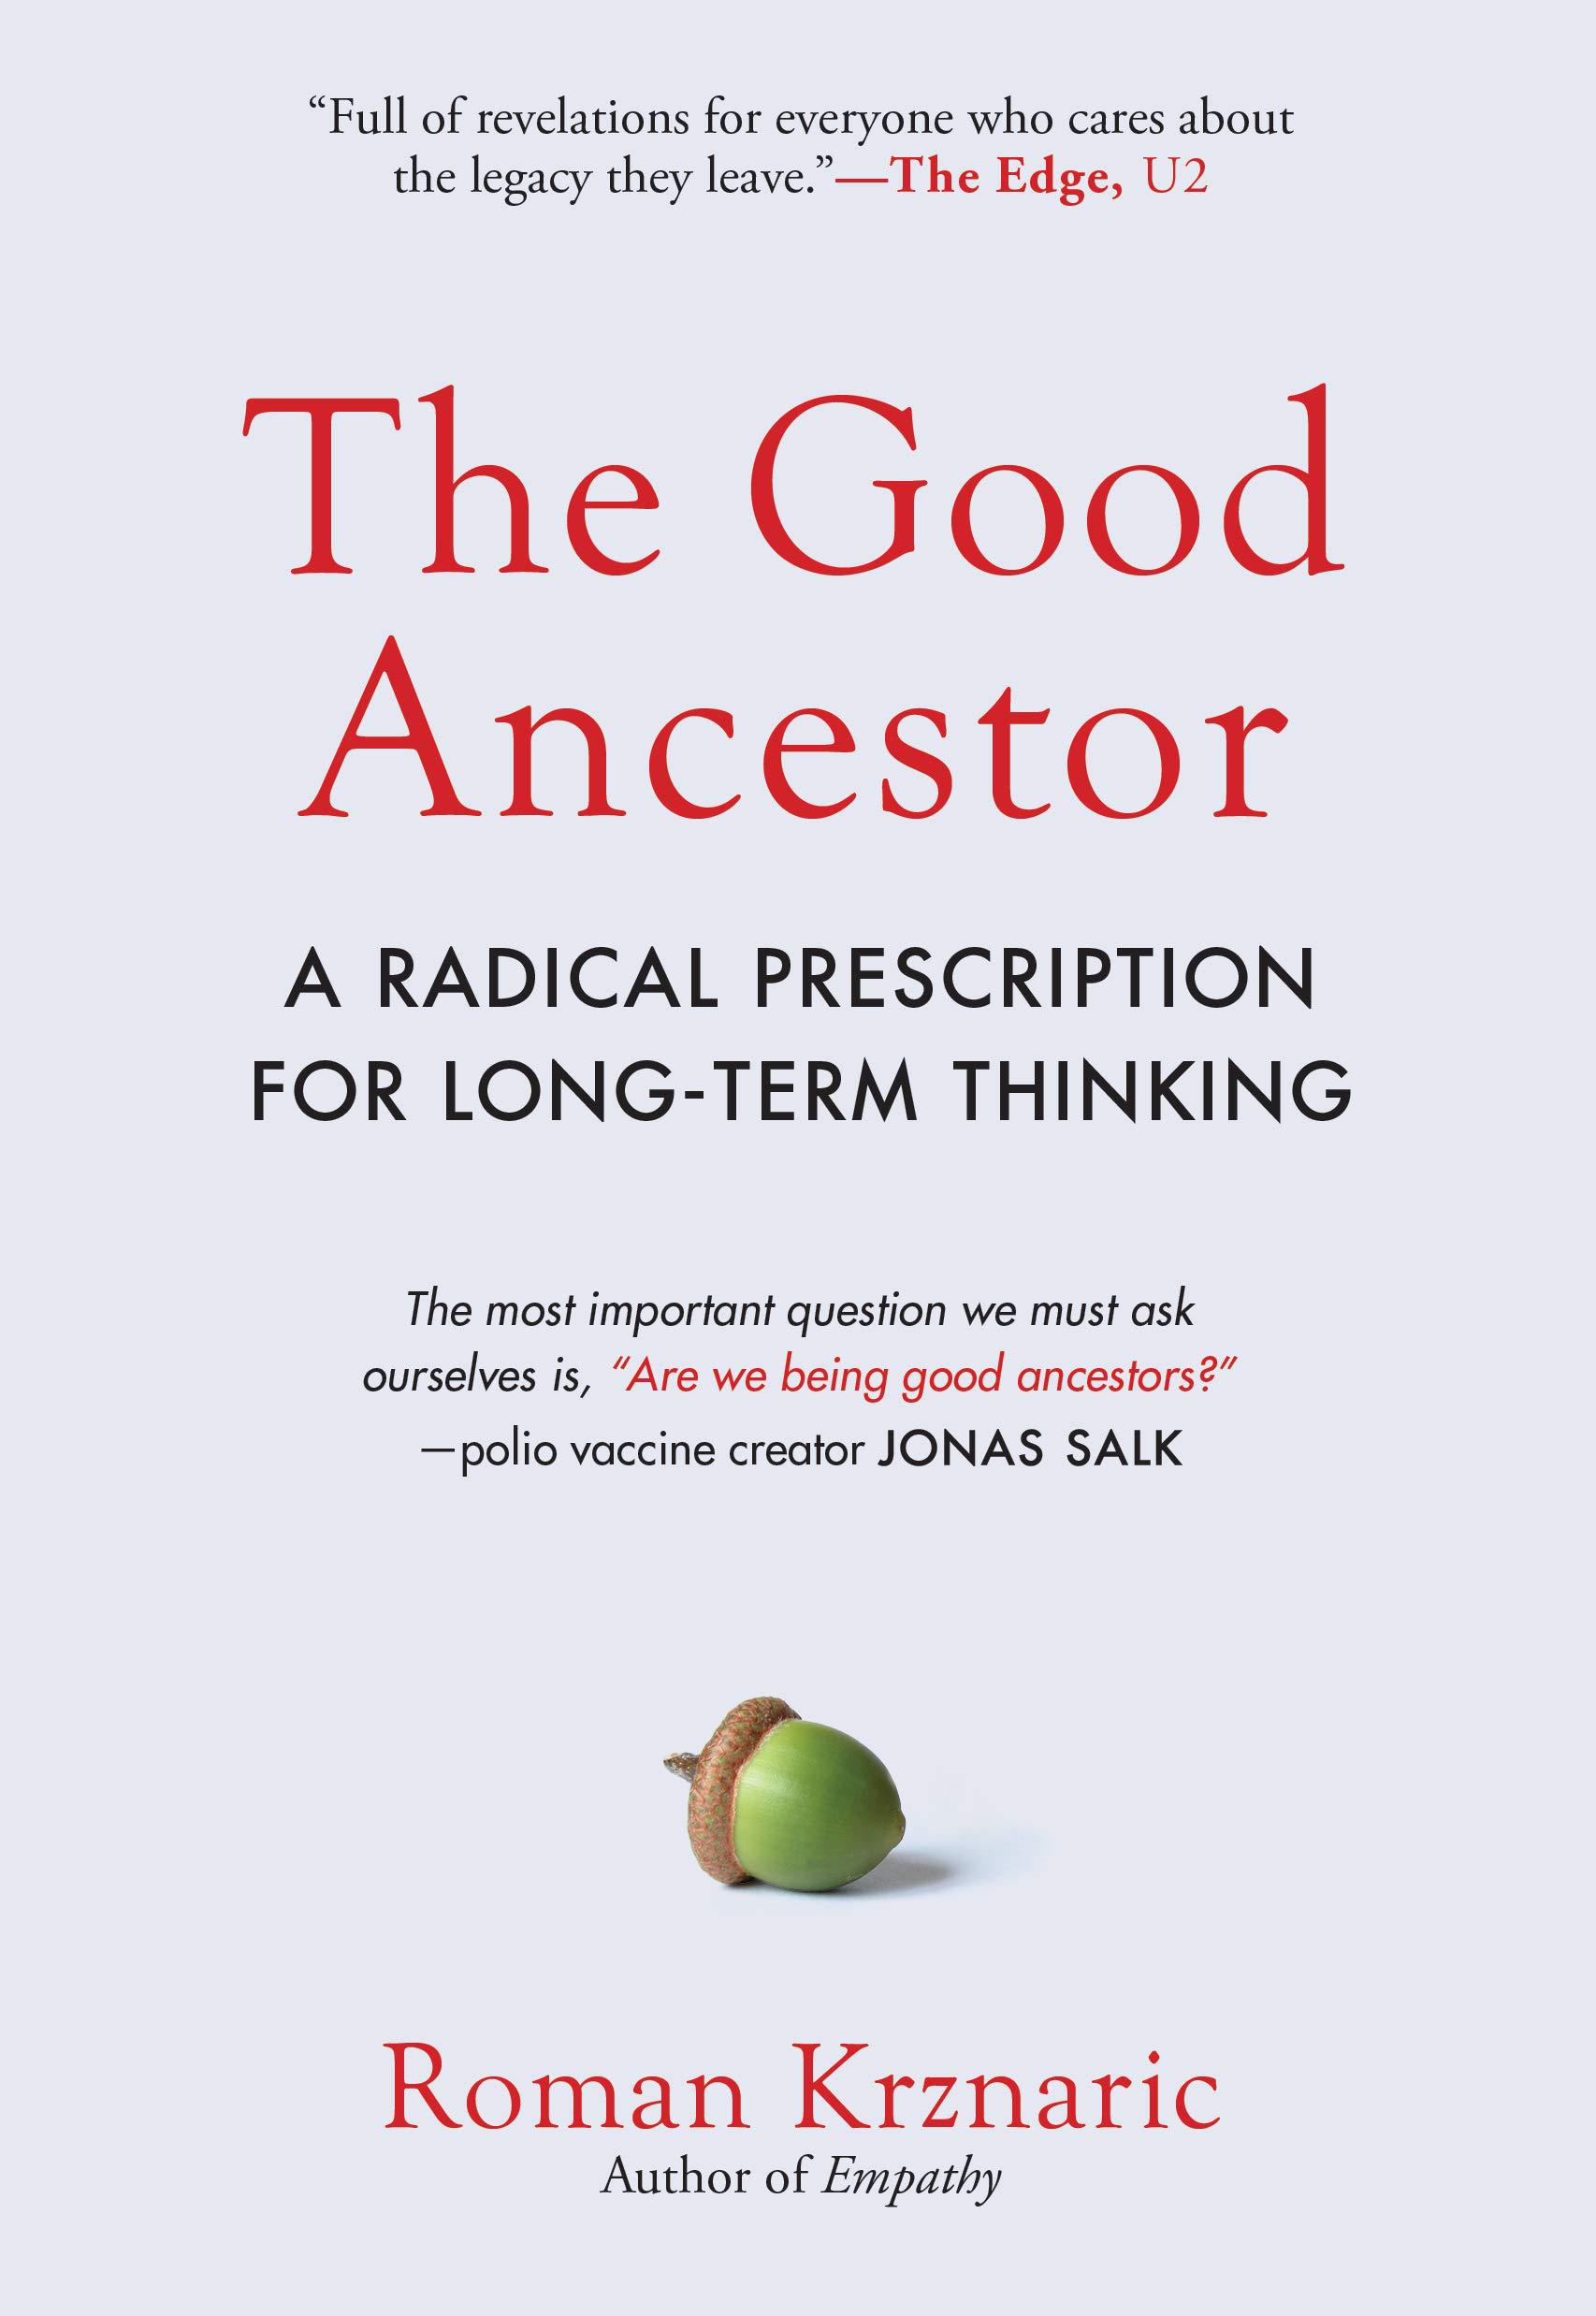 The Good Ancestor